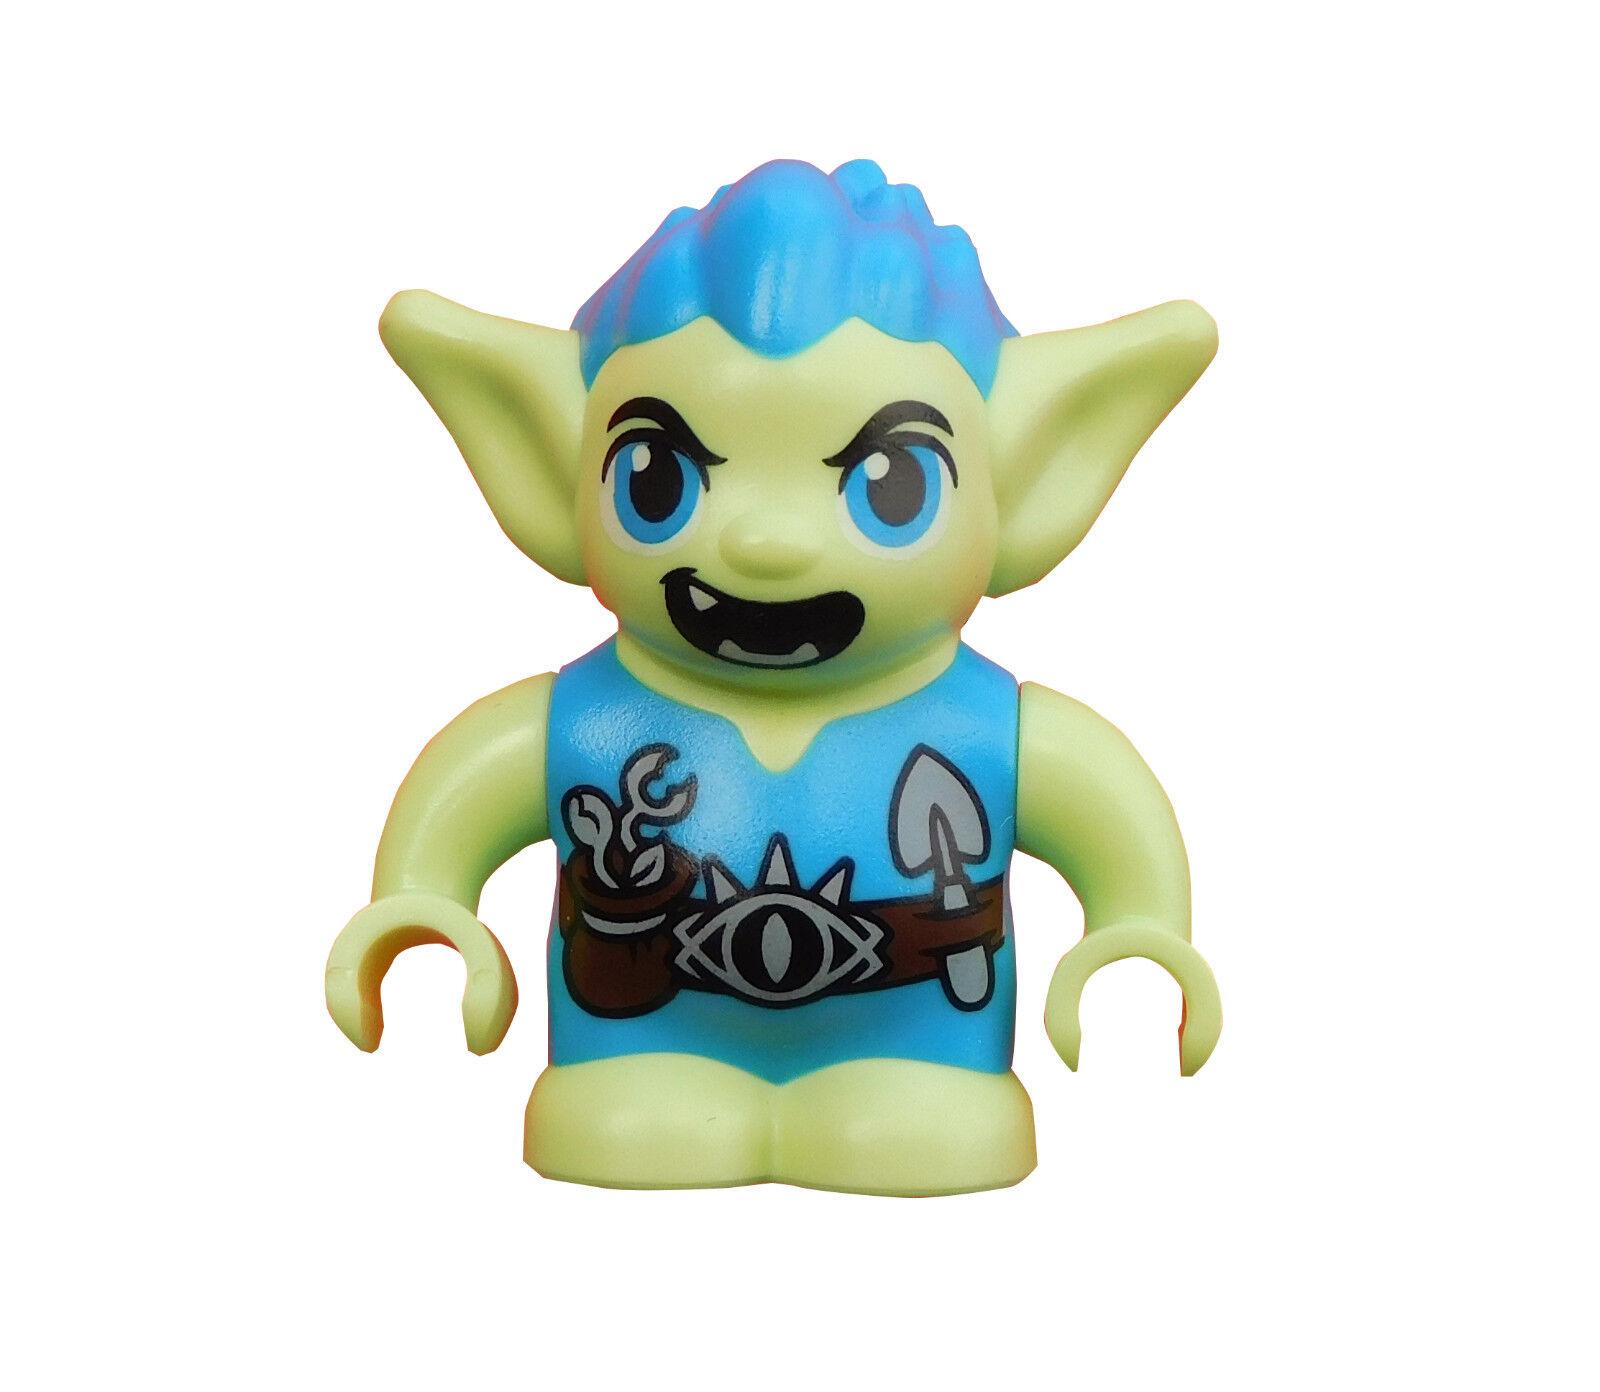 LEGO Minifiguren Lego Elves Figur Kobold Guxlin